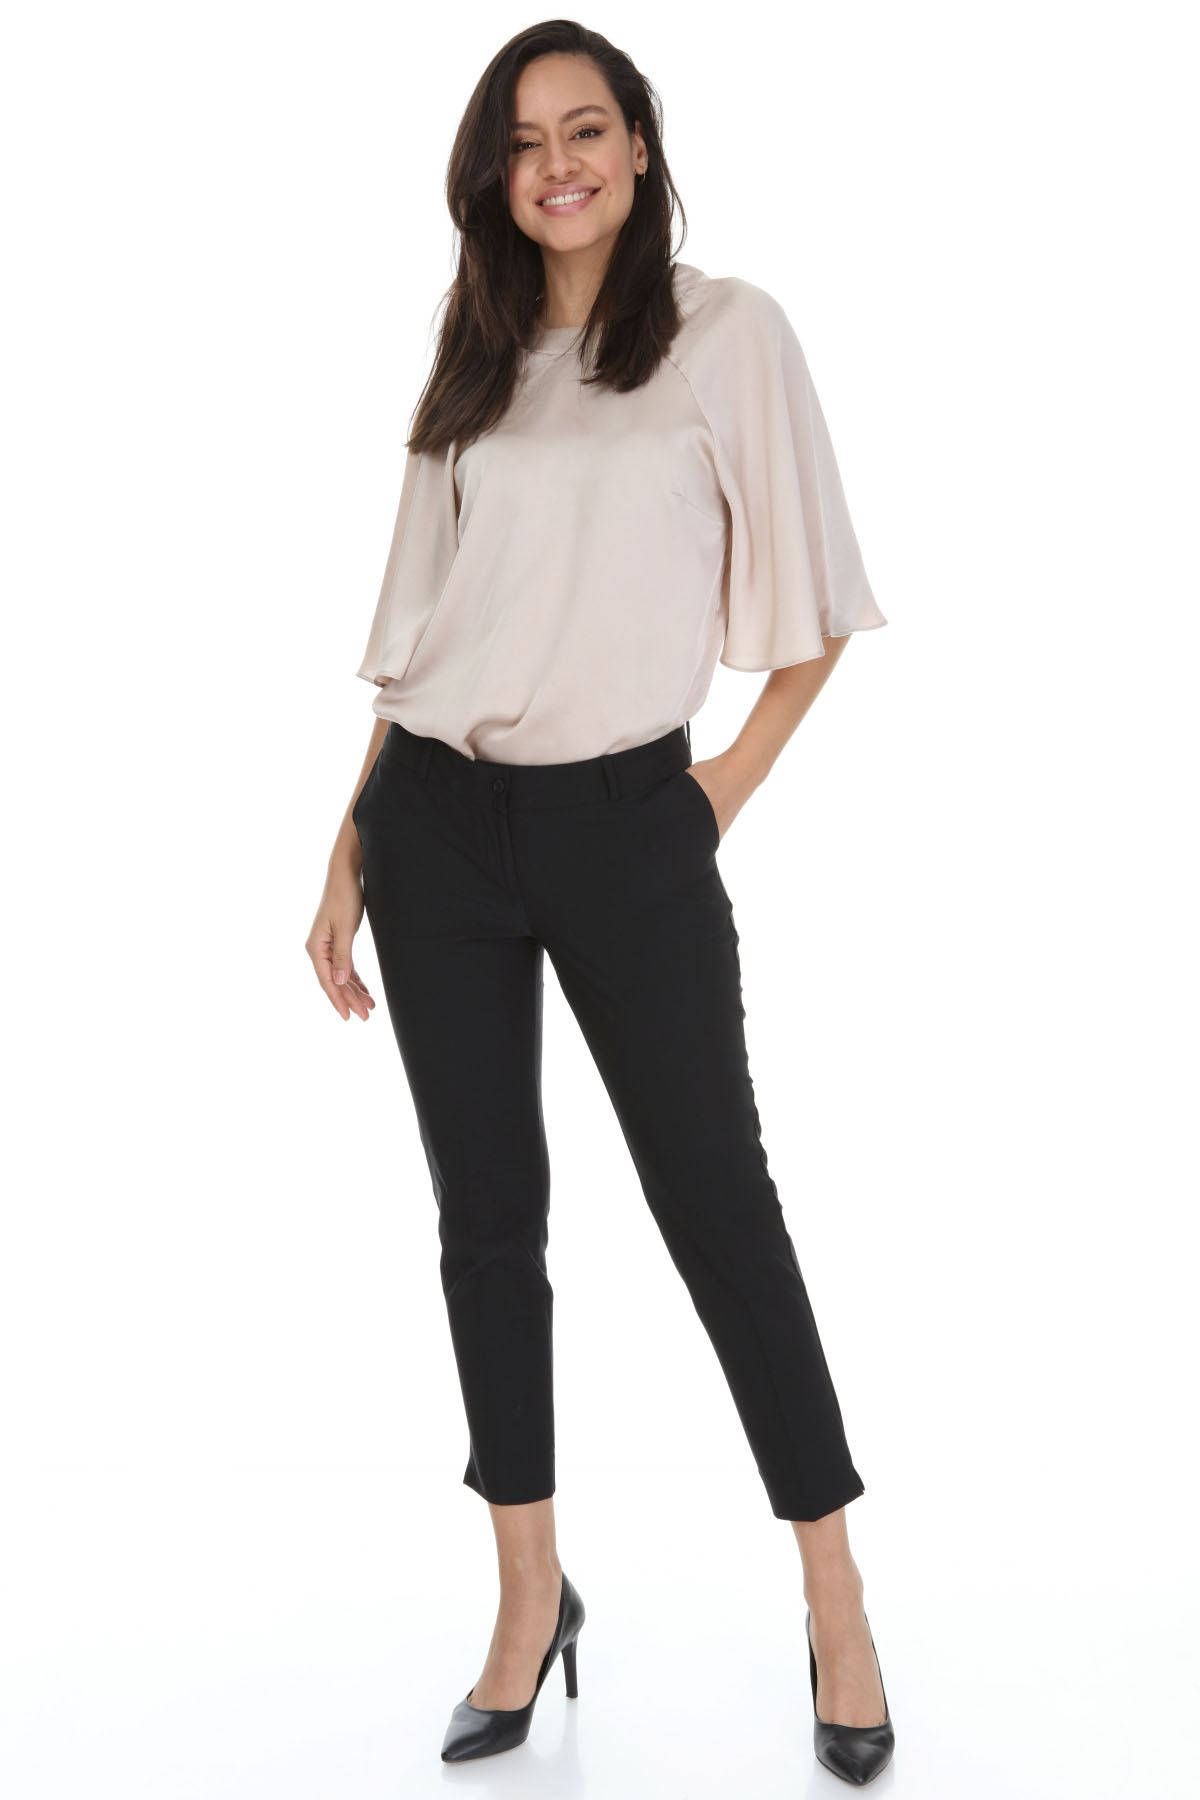 Siyah Kumaş Büyük Beden Pantolon 31E-3164